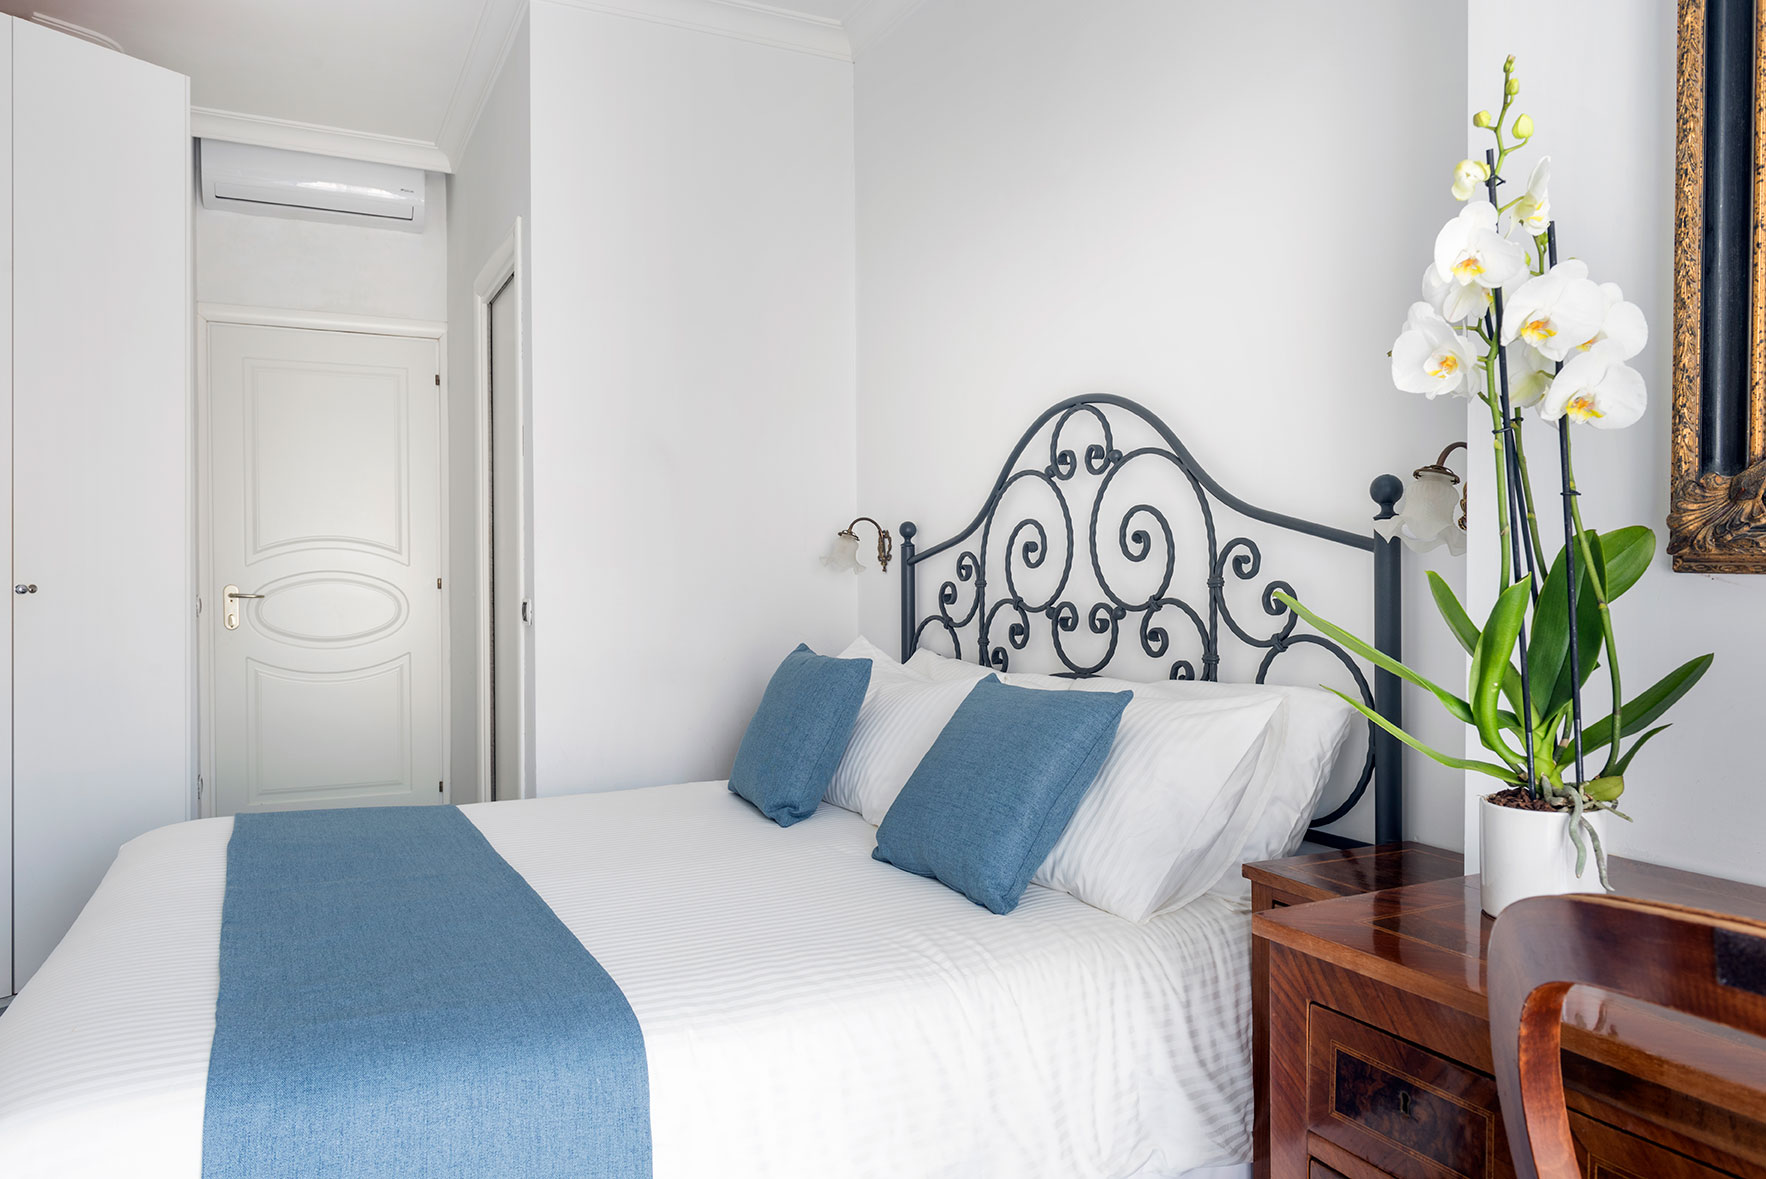 camere-standard-fiorentini-residence-napoli-6